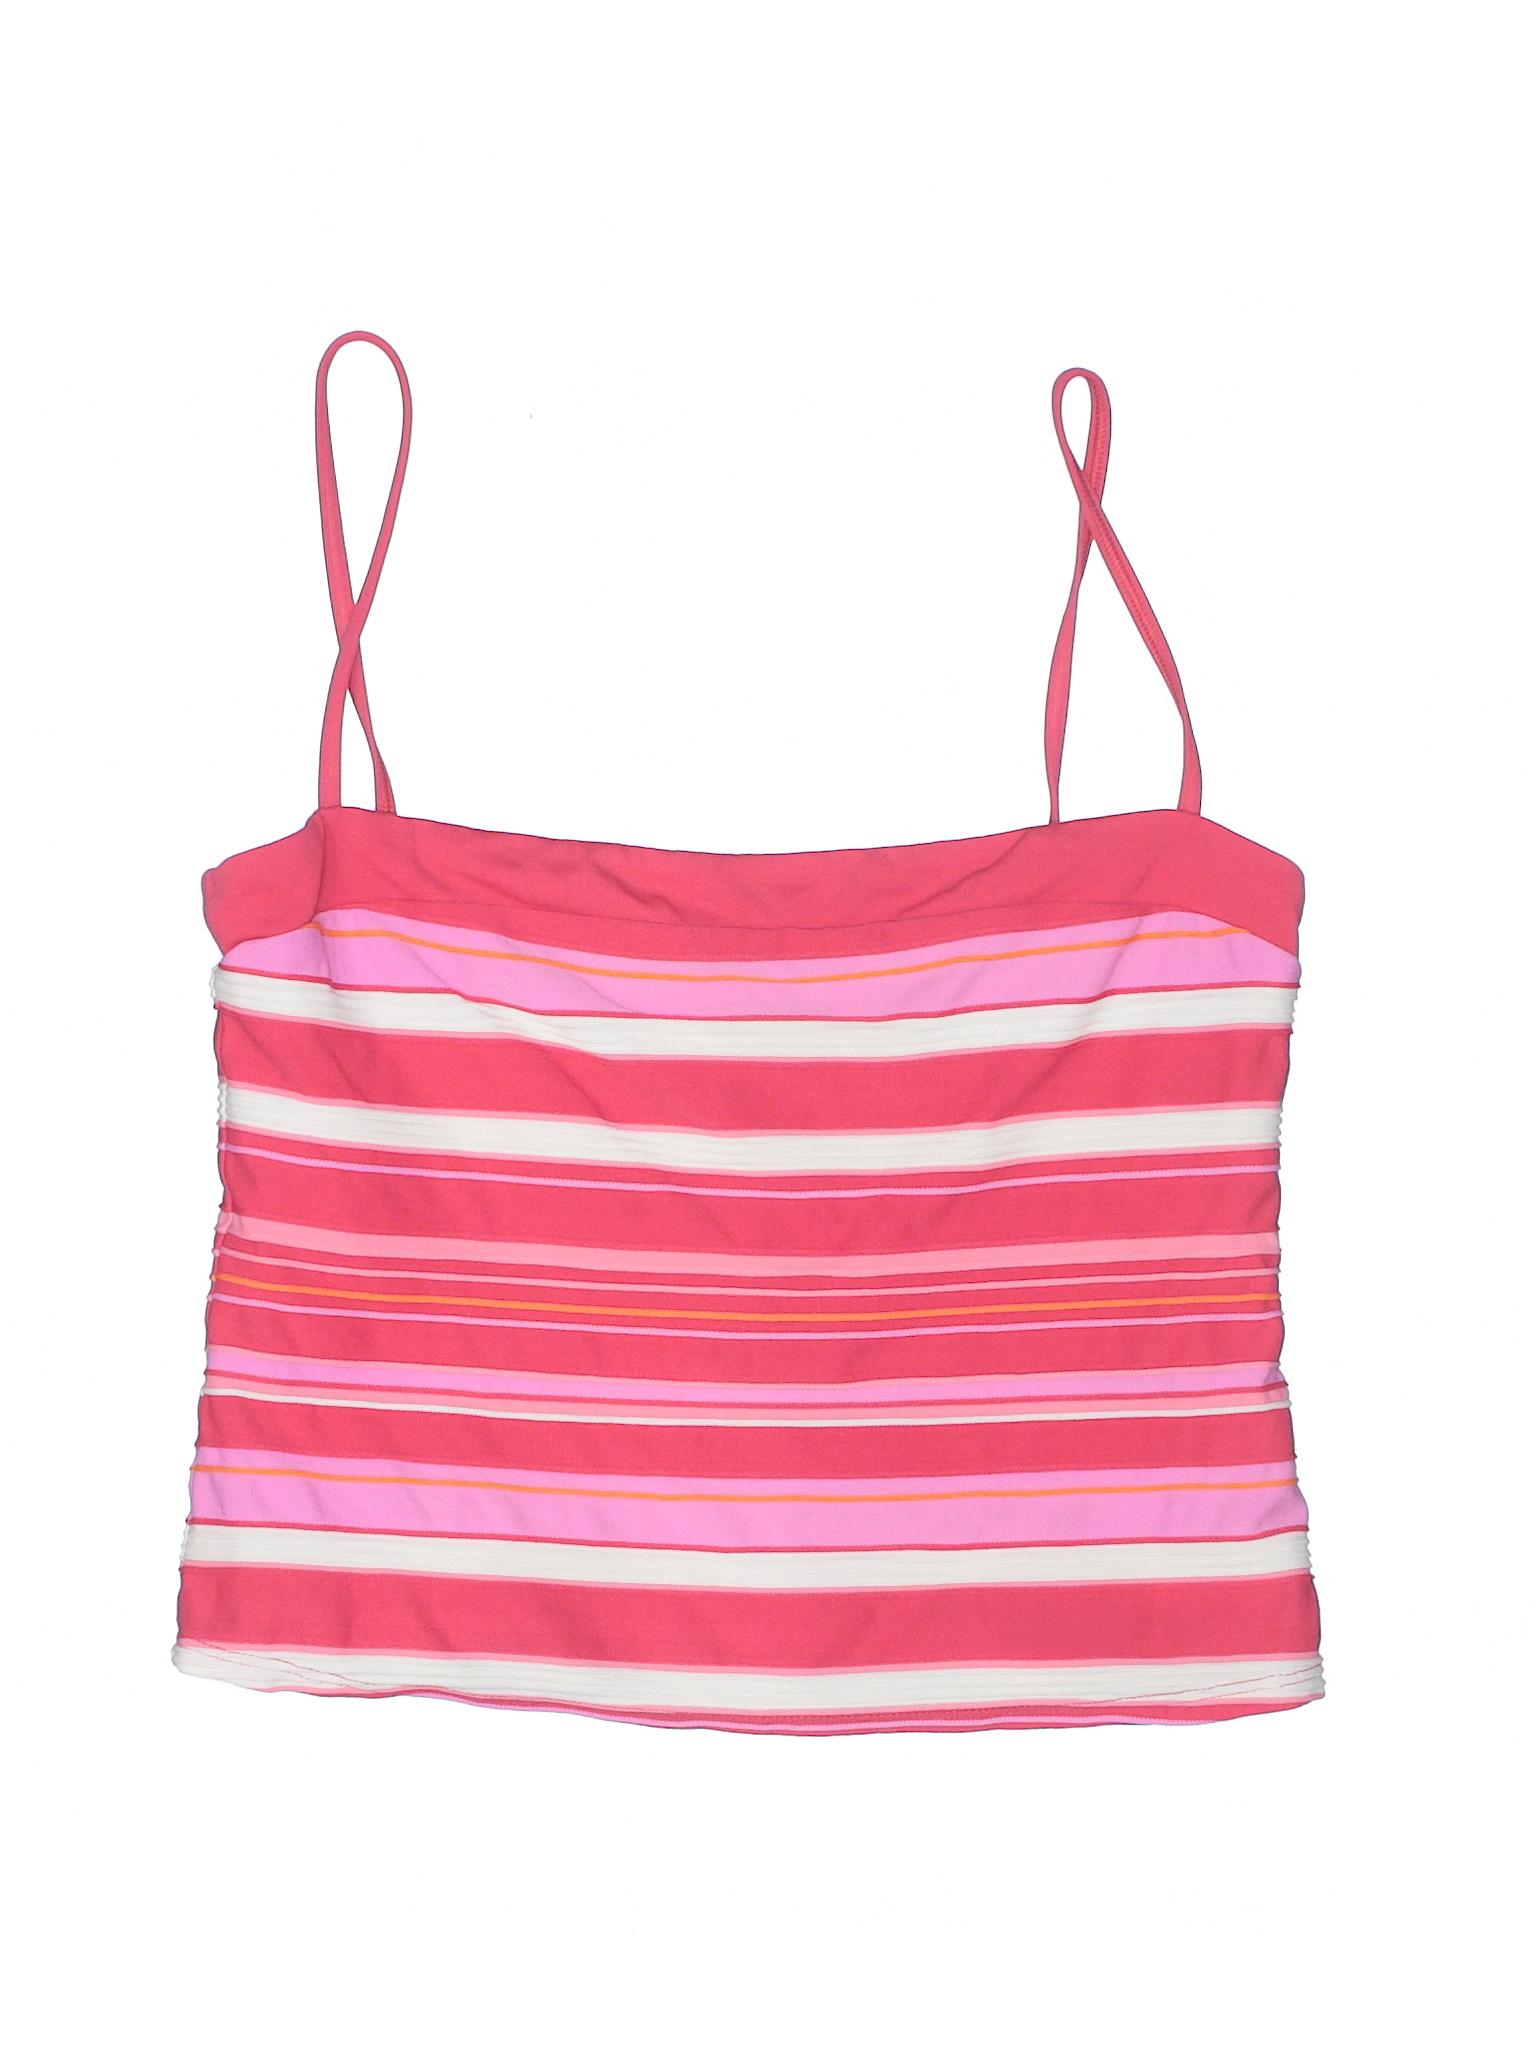 Blanca Boutique Top La Swimsuit La Boutique qOpg8OY